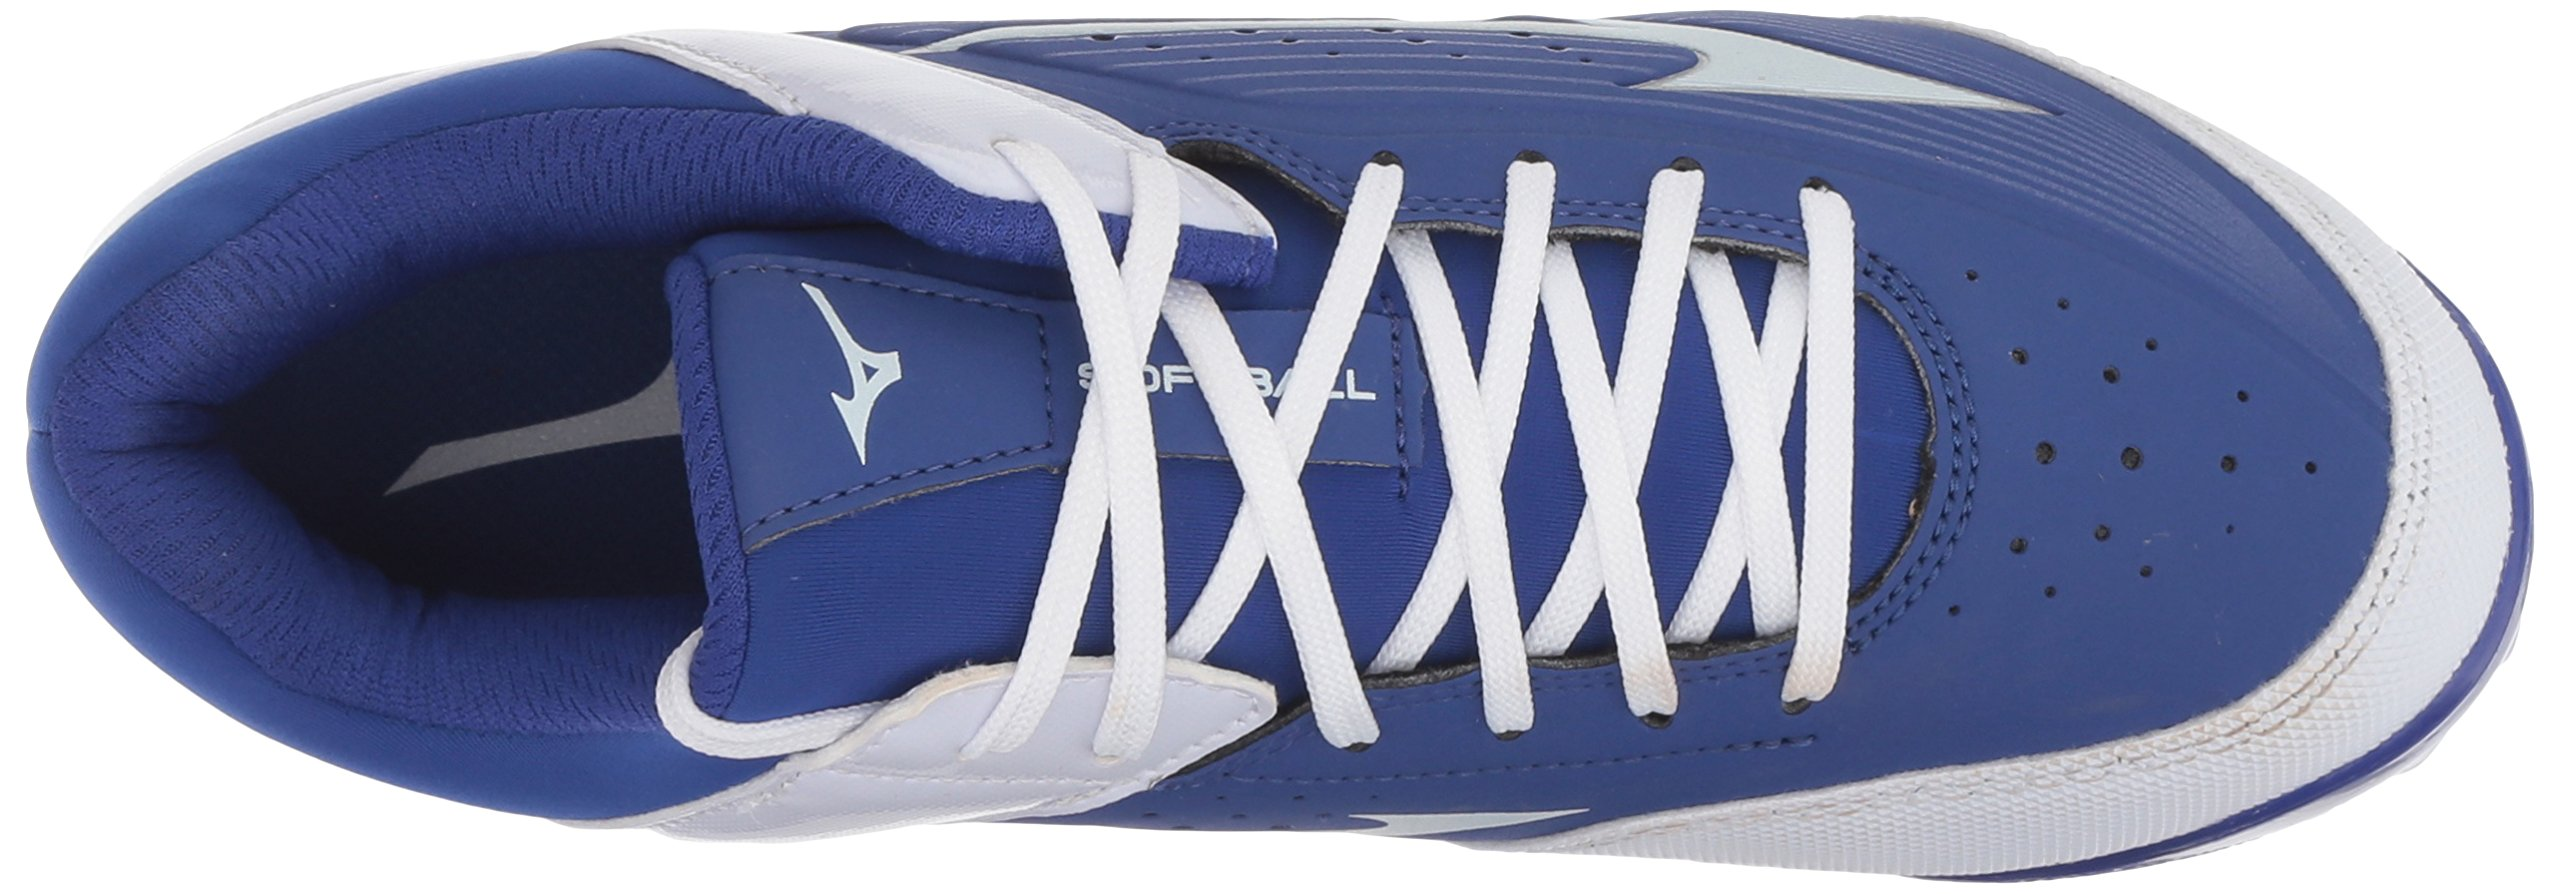 2d962413a Mizuno (MIZD9) 9-Spike Advanced Finch Elite 3 Womens Fastpitch Softball  Cleat Shoe   Sports   Fitness Features   Sports   Outdoors - tibs